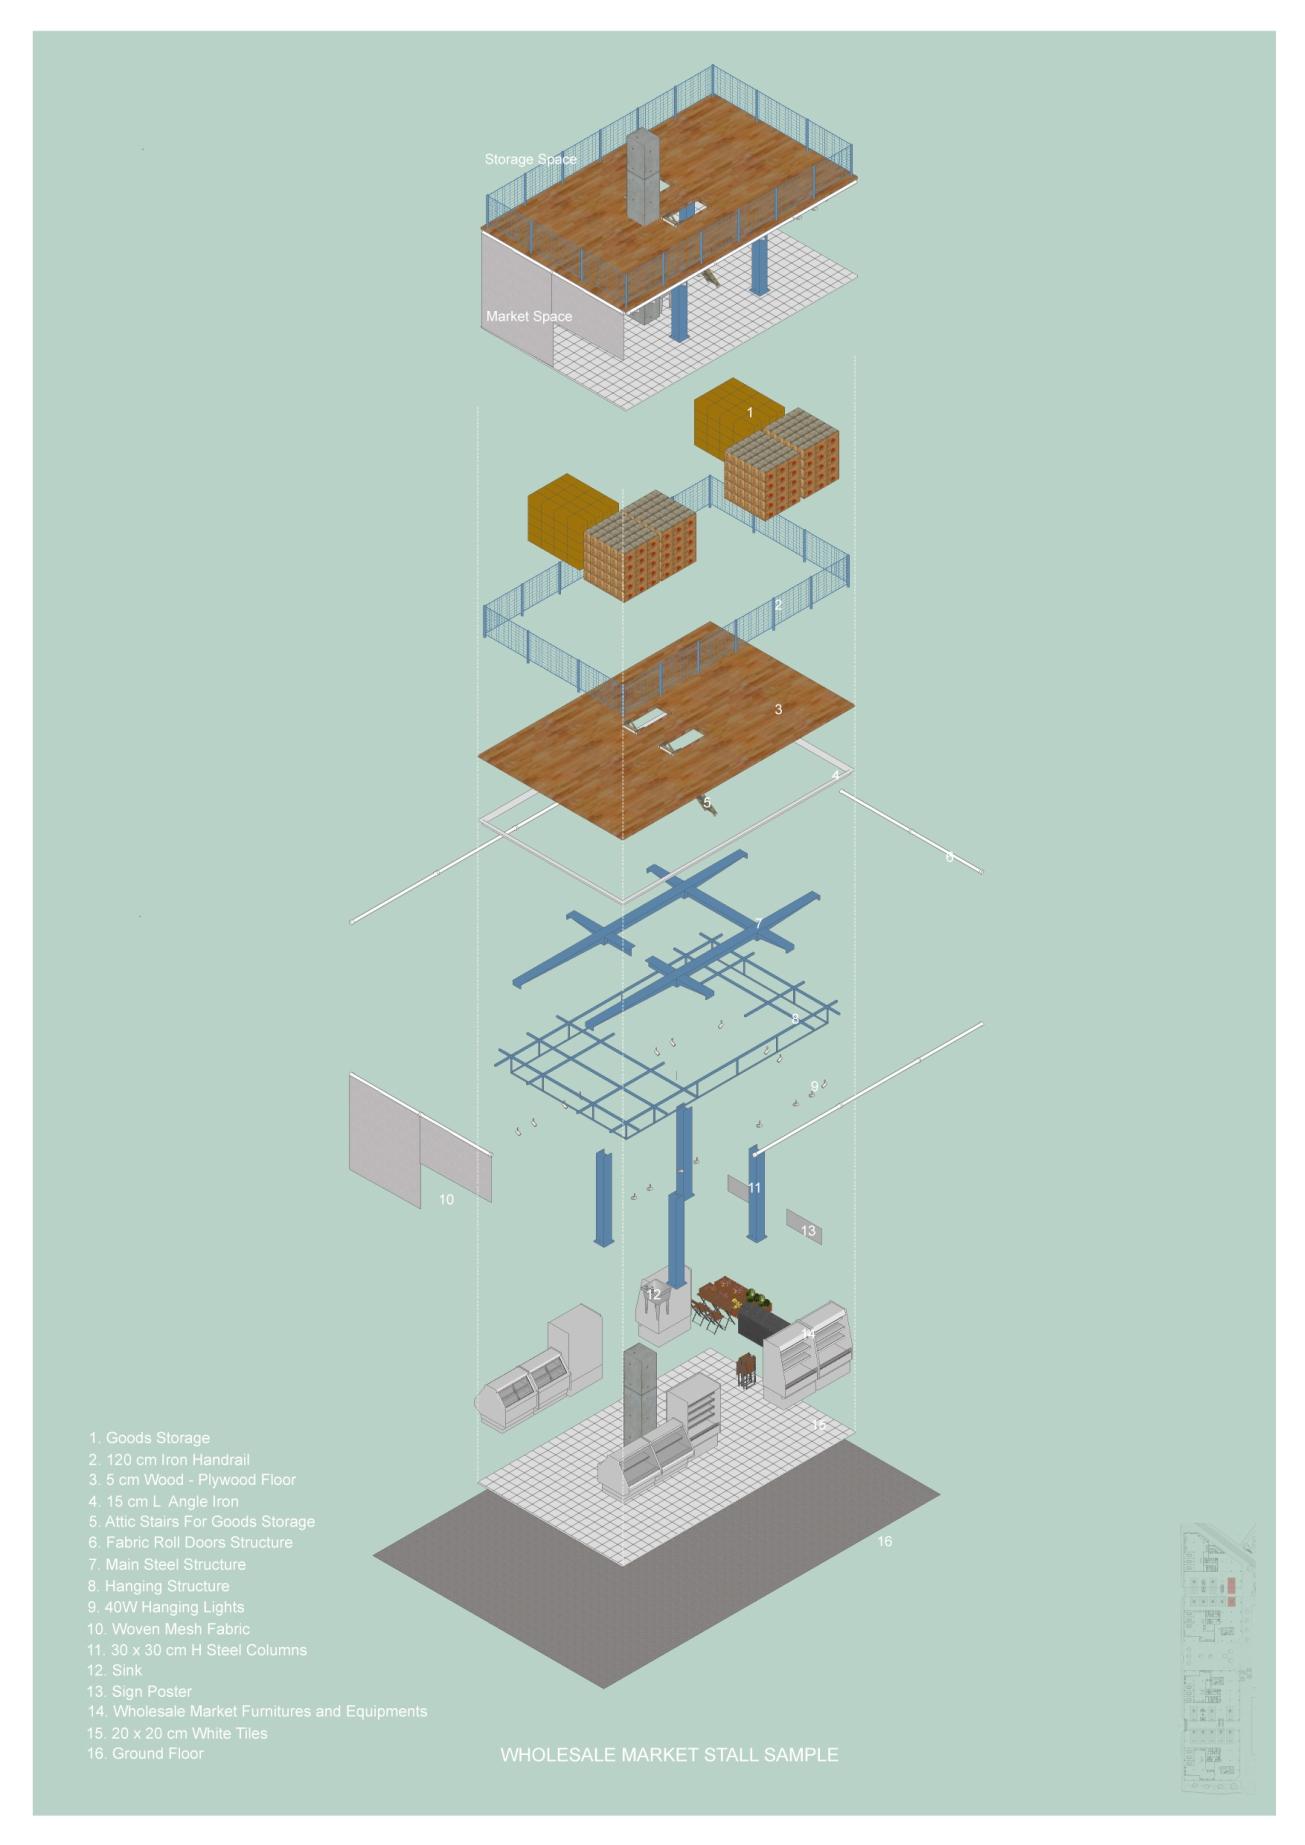 wholesale-market-stalls-explosion-diagram